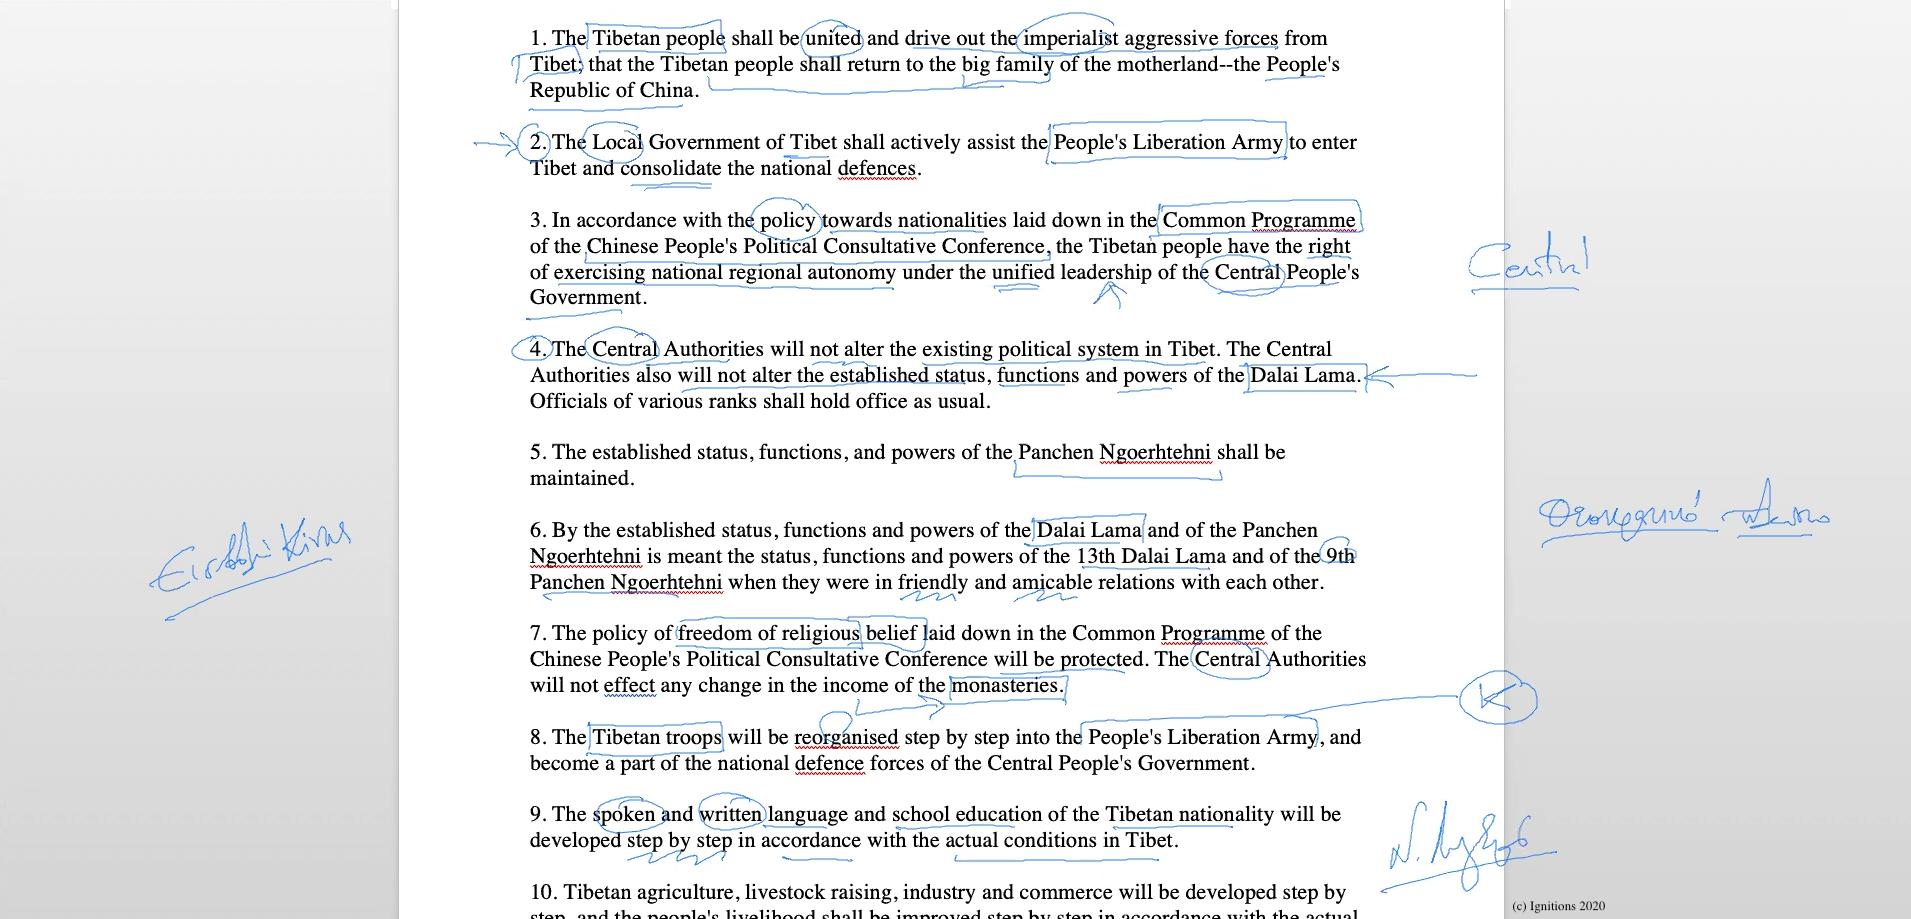 56239 - V - Ενάντια στην άγνοια και ο Αγώνας του Θιβέτ. Αγώνας III. (Dessin)